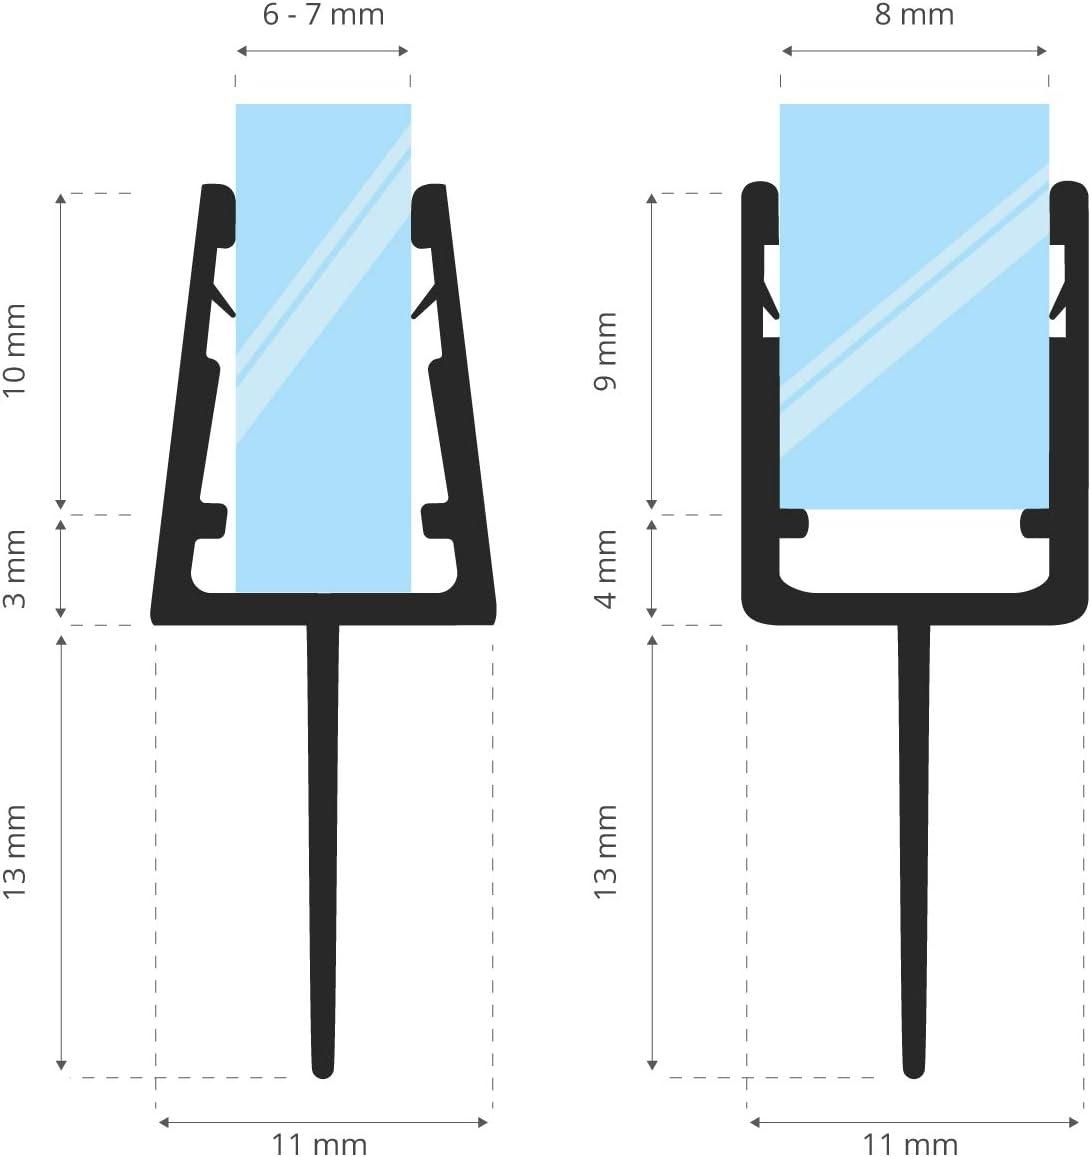 Cabina de Ducha Semicircular Junta Semicircular Para las Mamparas de 5 mm// 6 mm// 7 mm// 8 mm STEIGNER Junta de Ducha Curvada 70 cm UK10 Ducha Redonda Junta de Repuesto Semicircular